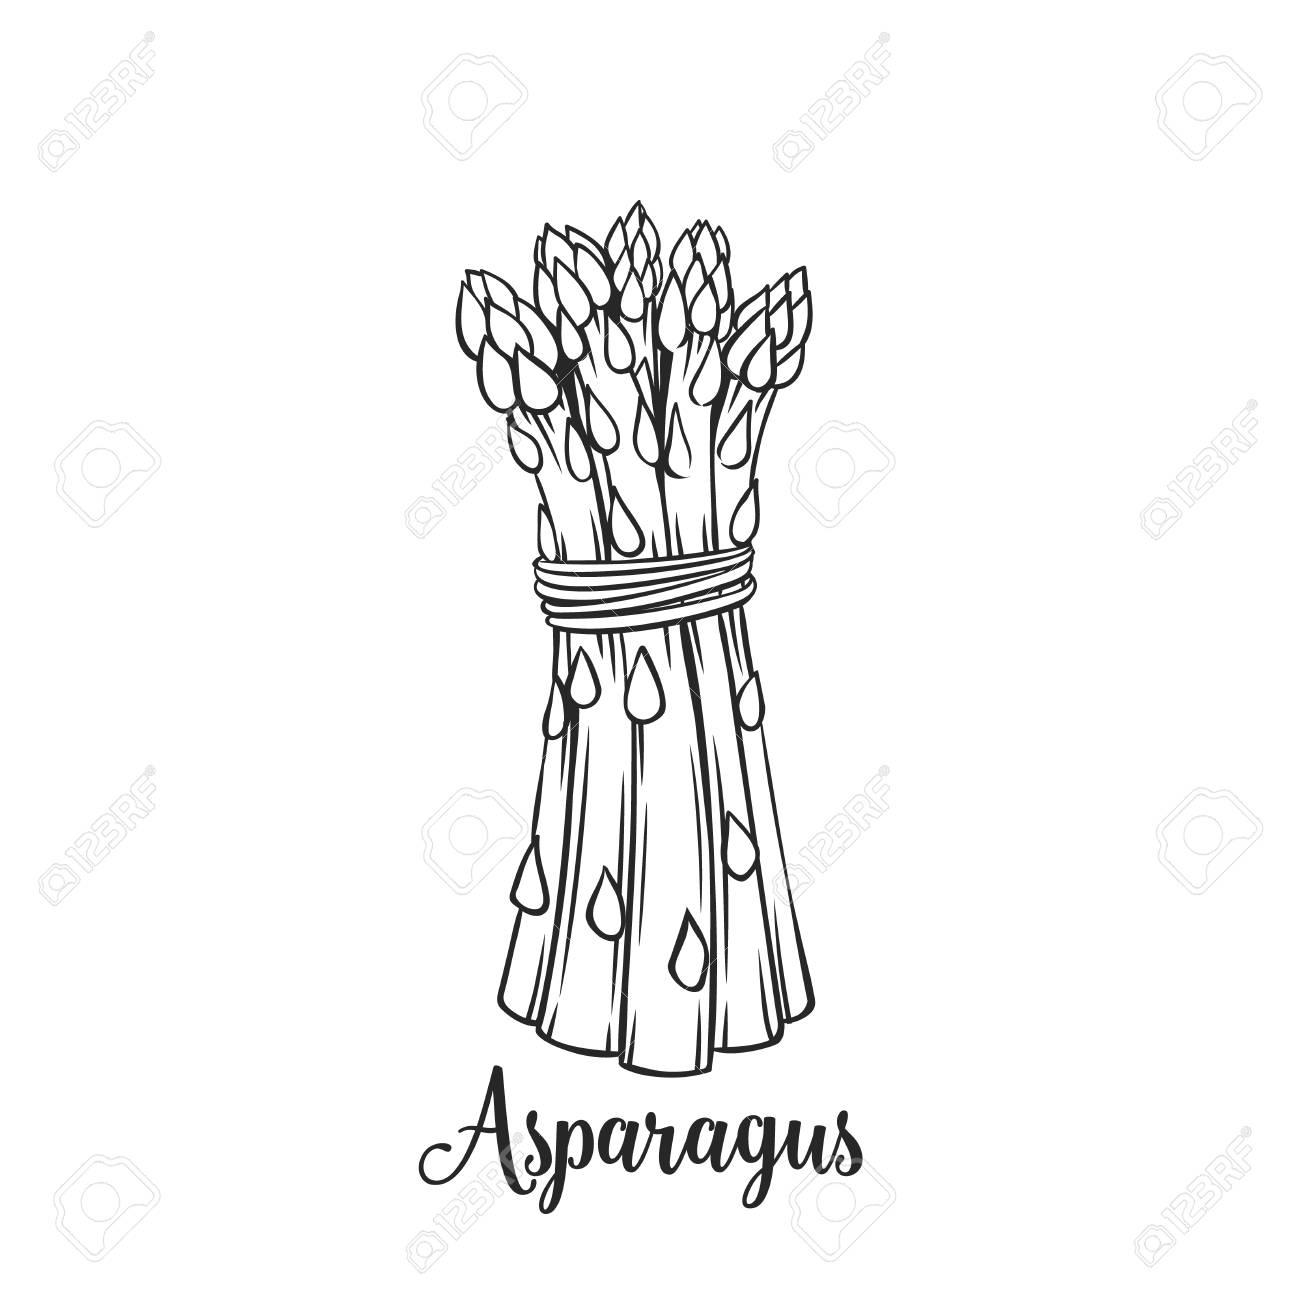 1299x1300 Hand Drawn Asparagus Icon. Royalty Free Cliparts, Vectors,